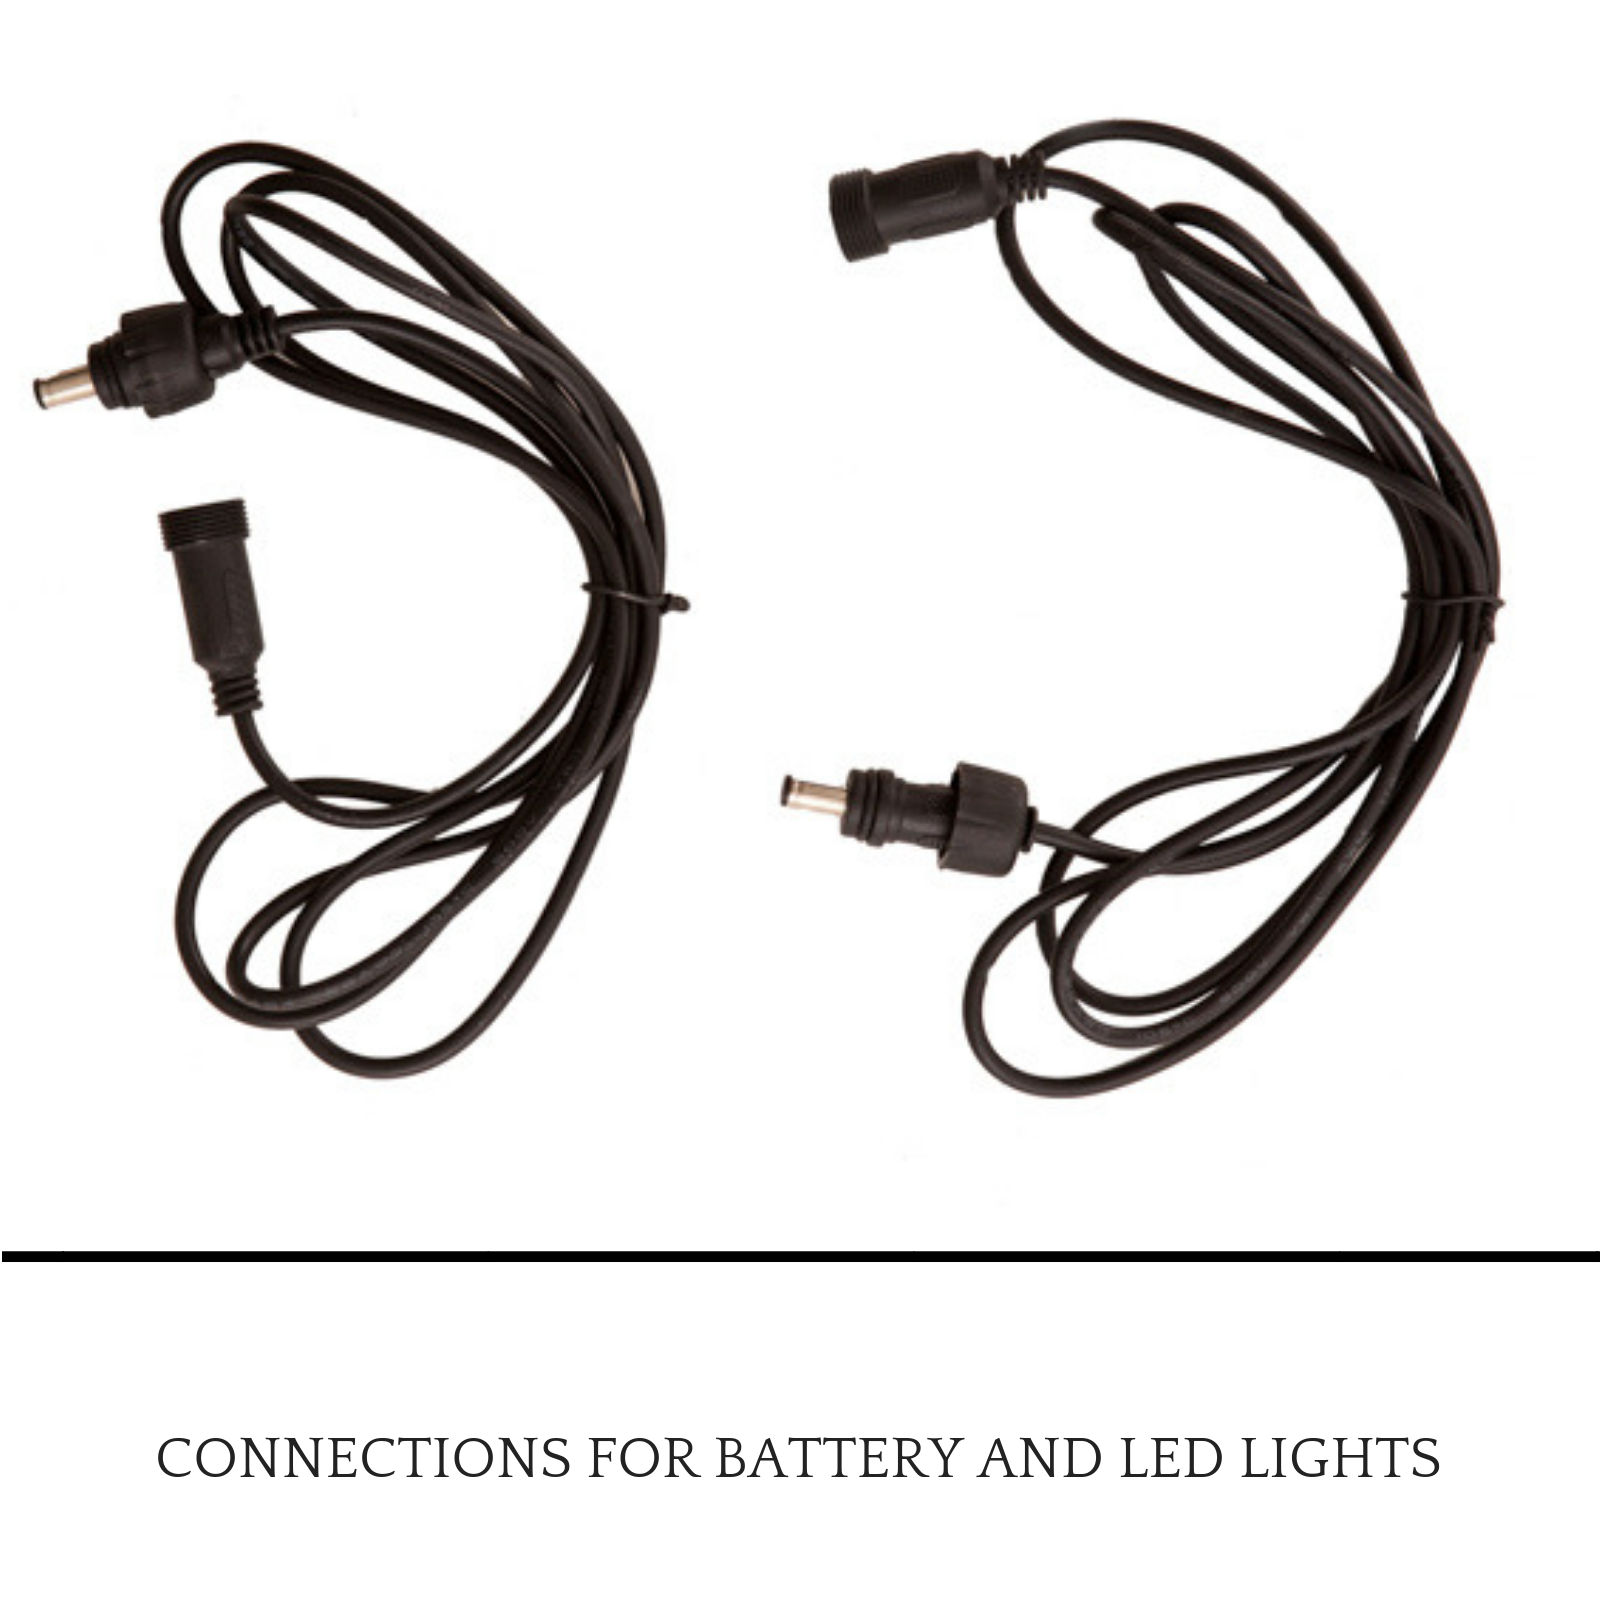 illuminator led driving light wiring harness - to fit 7 u0026quot  lights